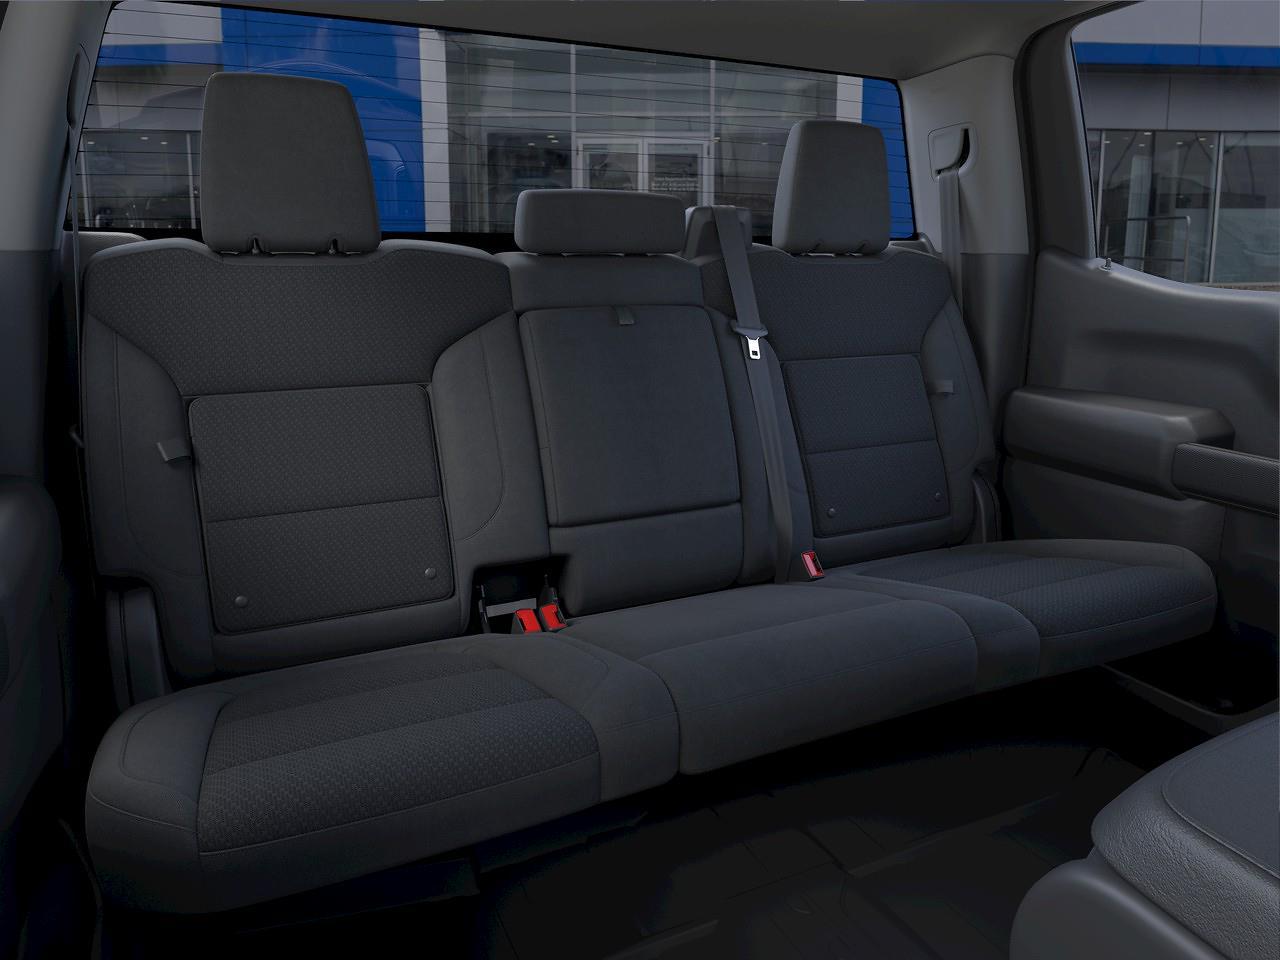 2021 Chevrolet Silverado 1500 Crew Cab 4x4, Pickup #M1314 - photo 14